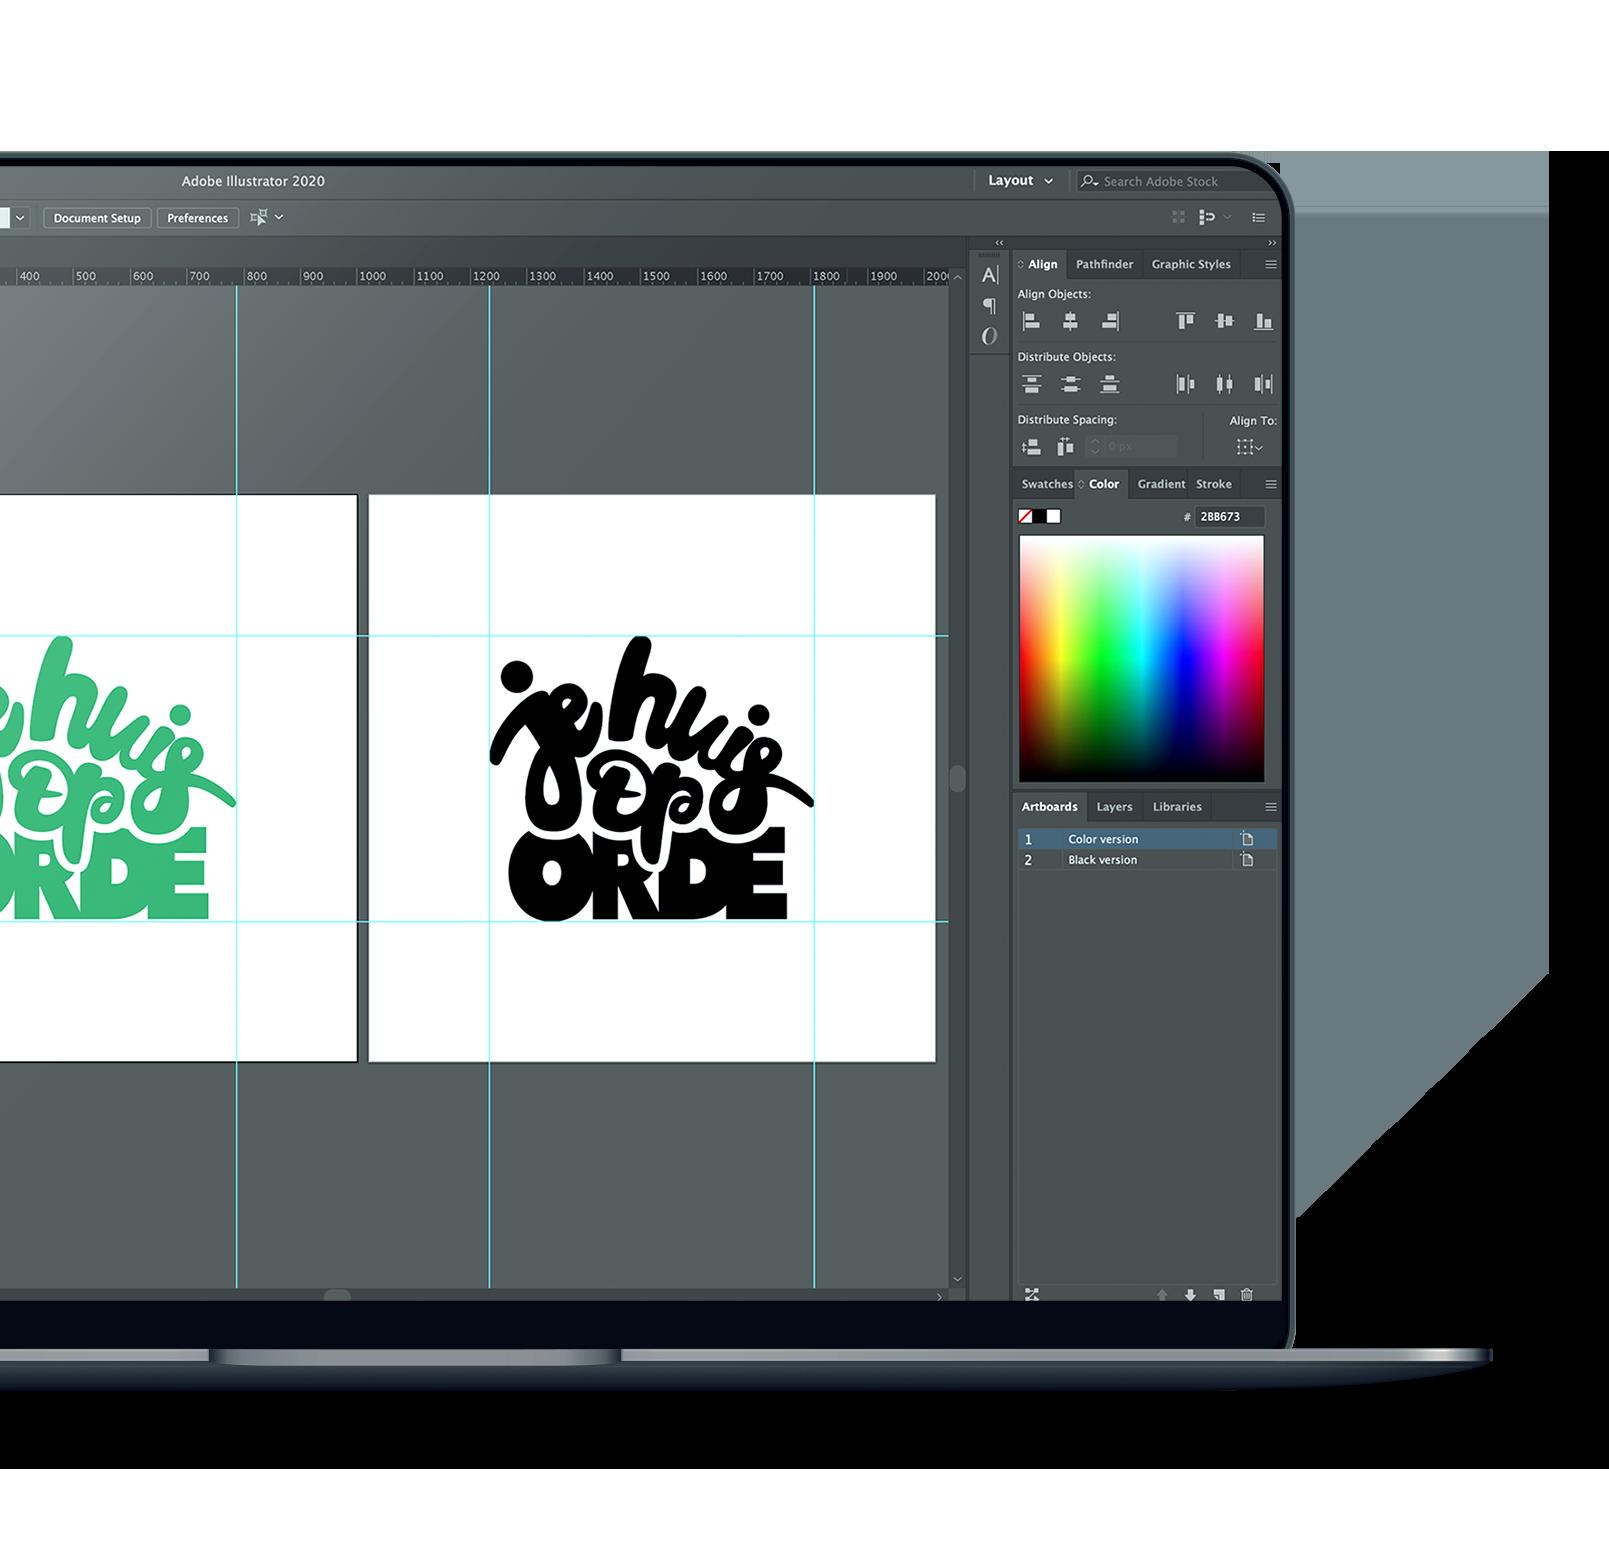 Logo ontwerp via illustrator